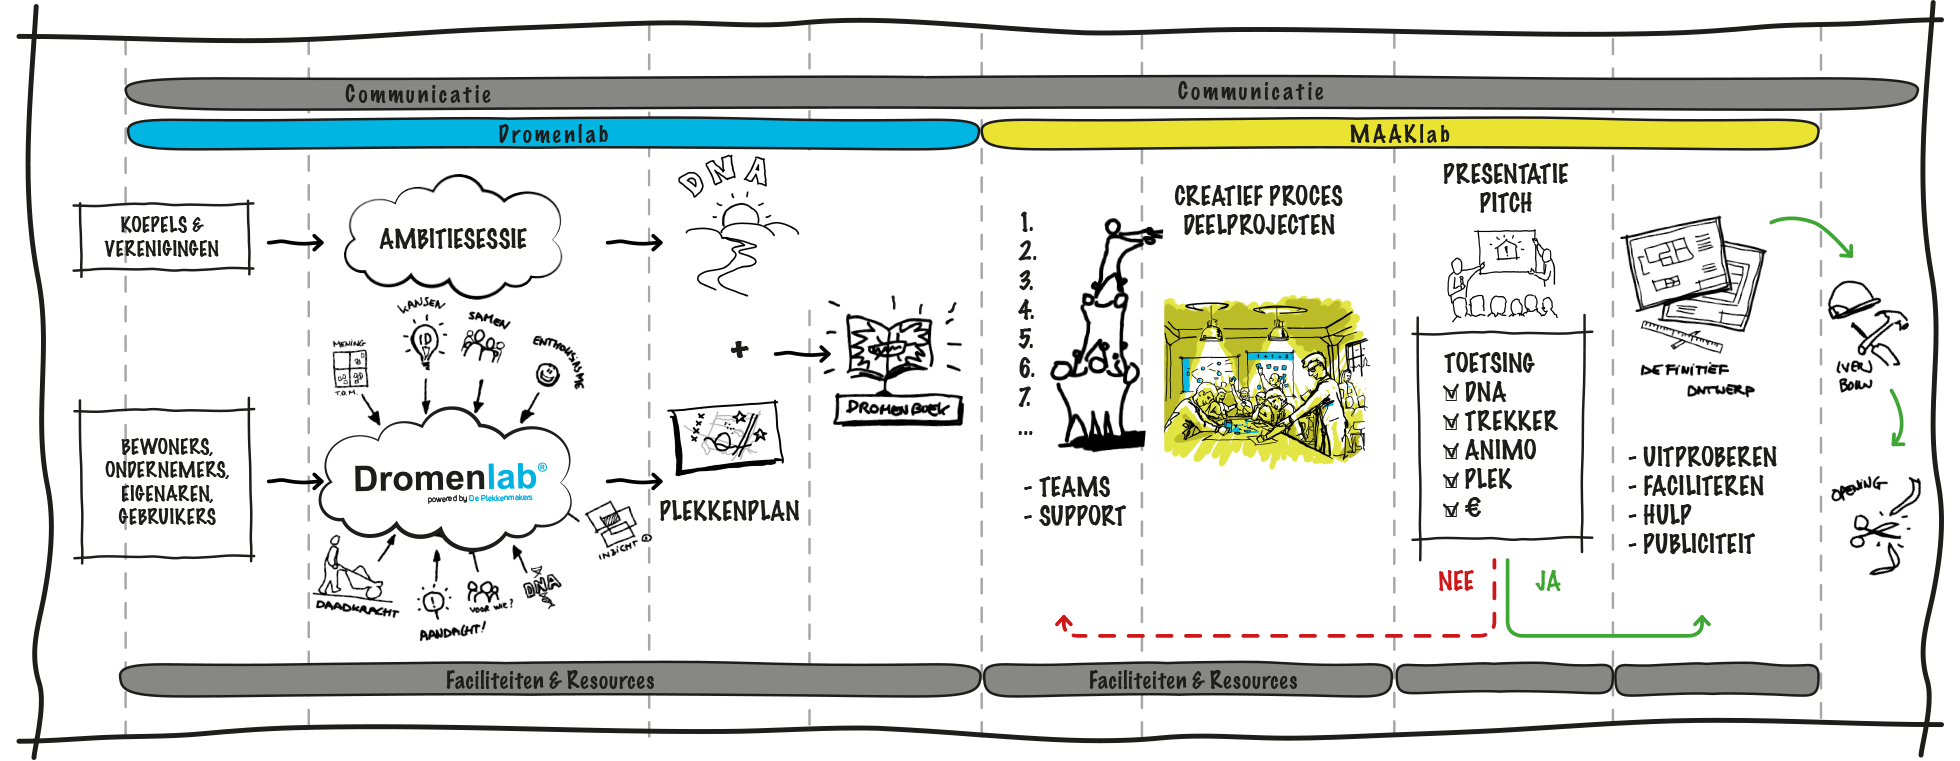 Proces Dromenlab naar MAAKlab